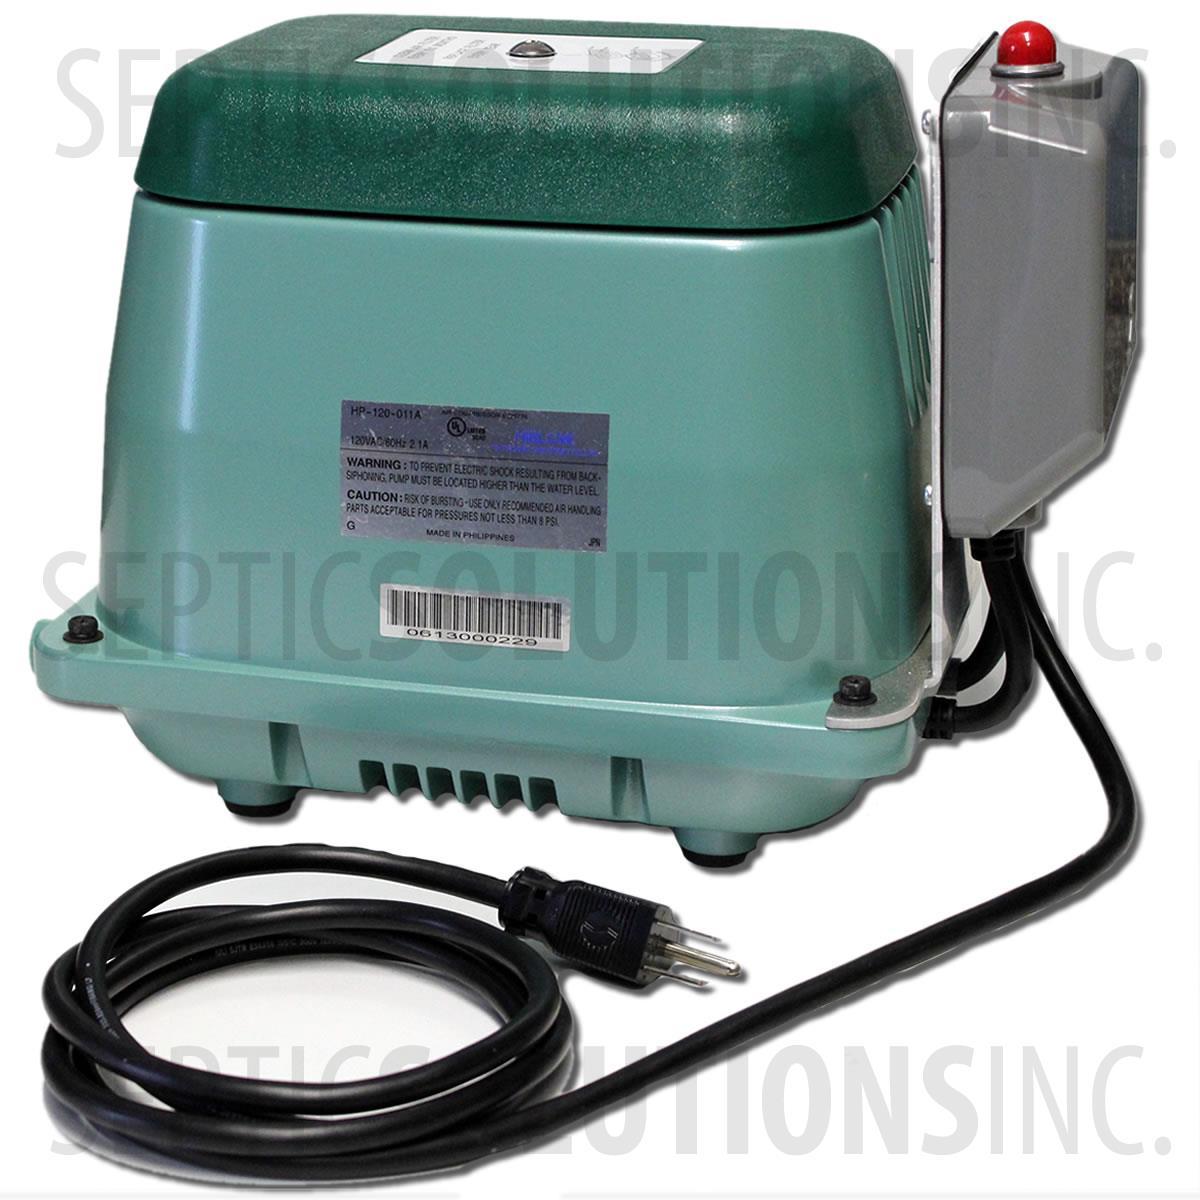 Hiblow Hp 120ll 011a Linear Septic Air Pump Fast Amp Free